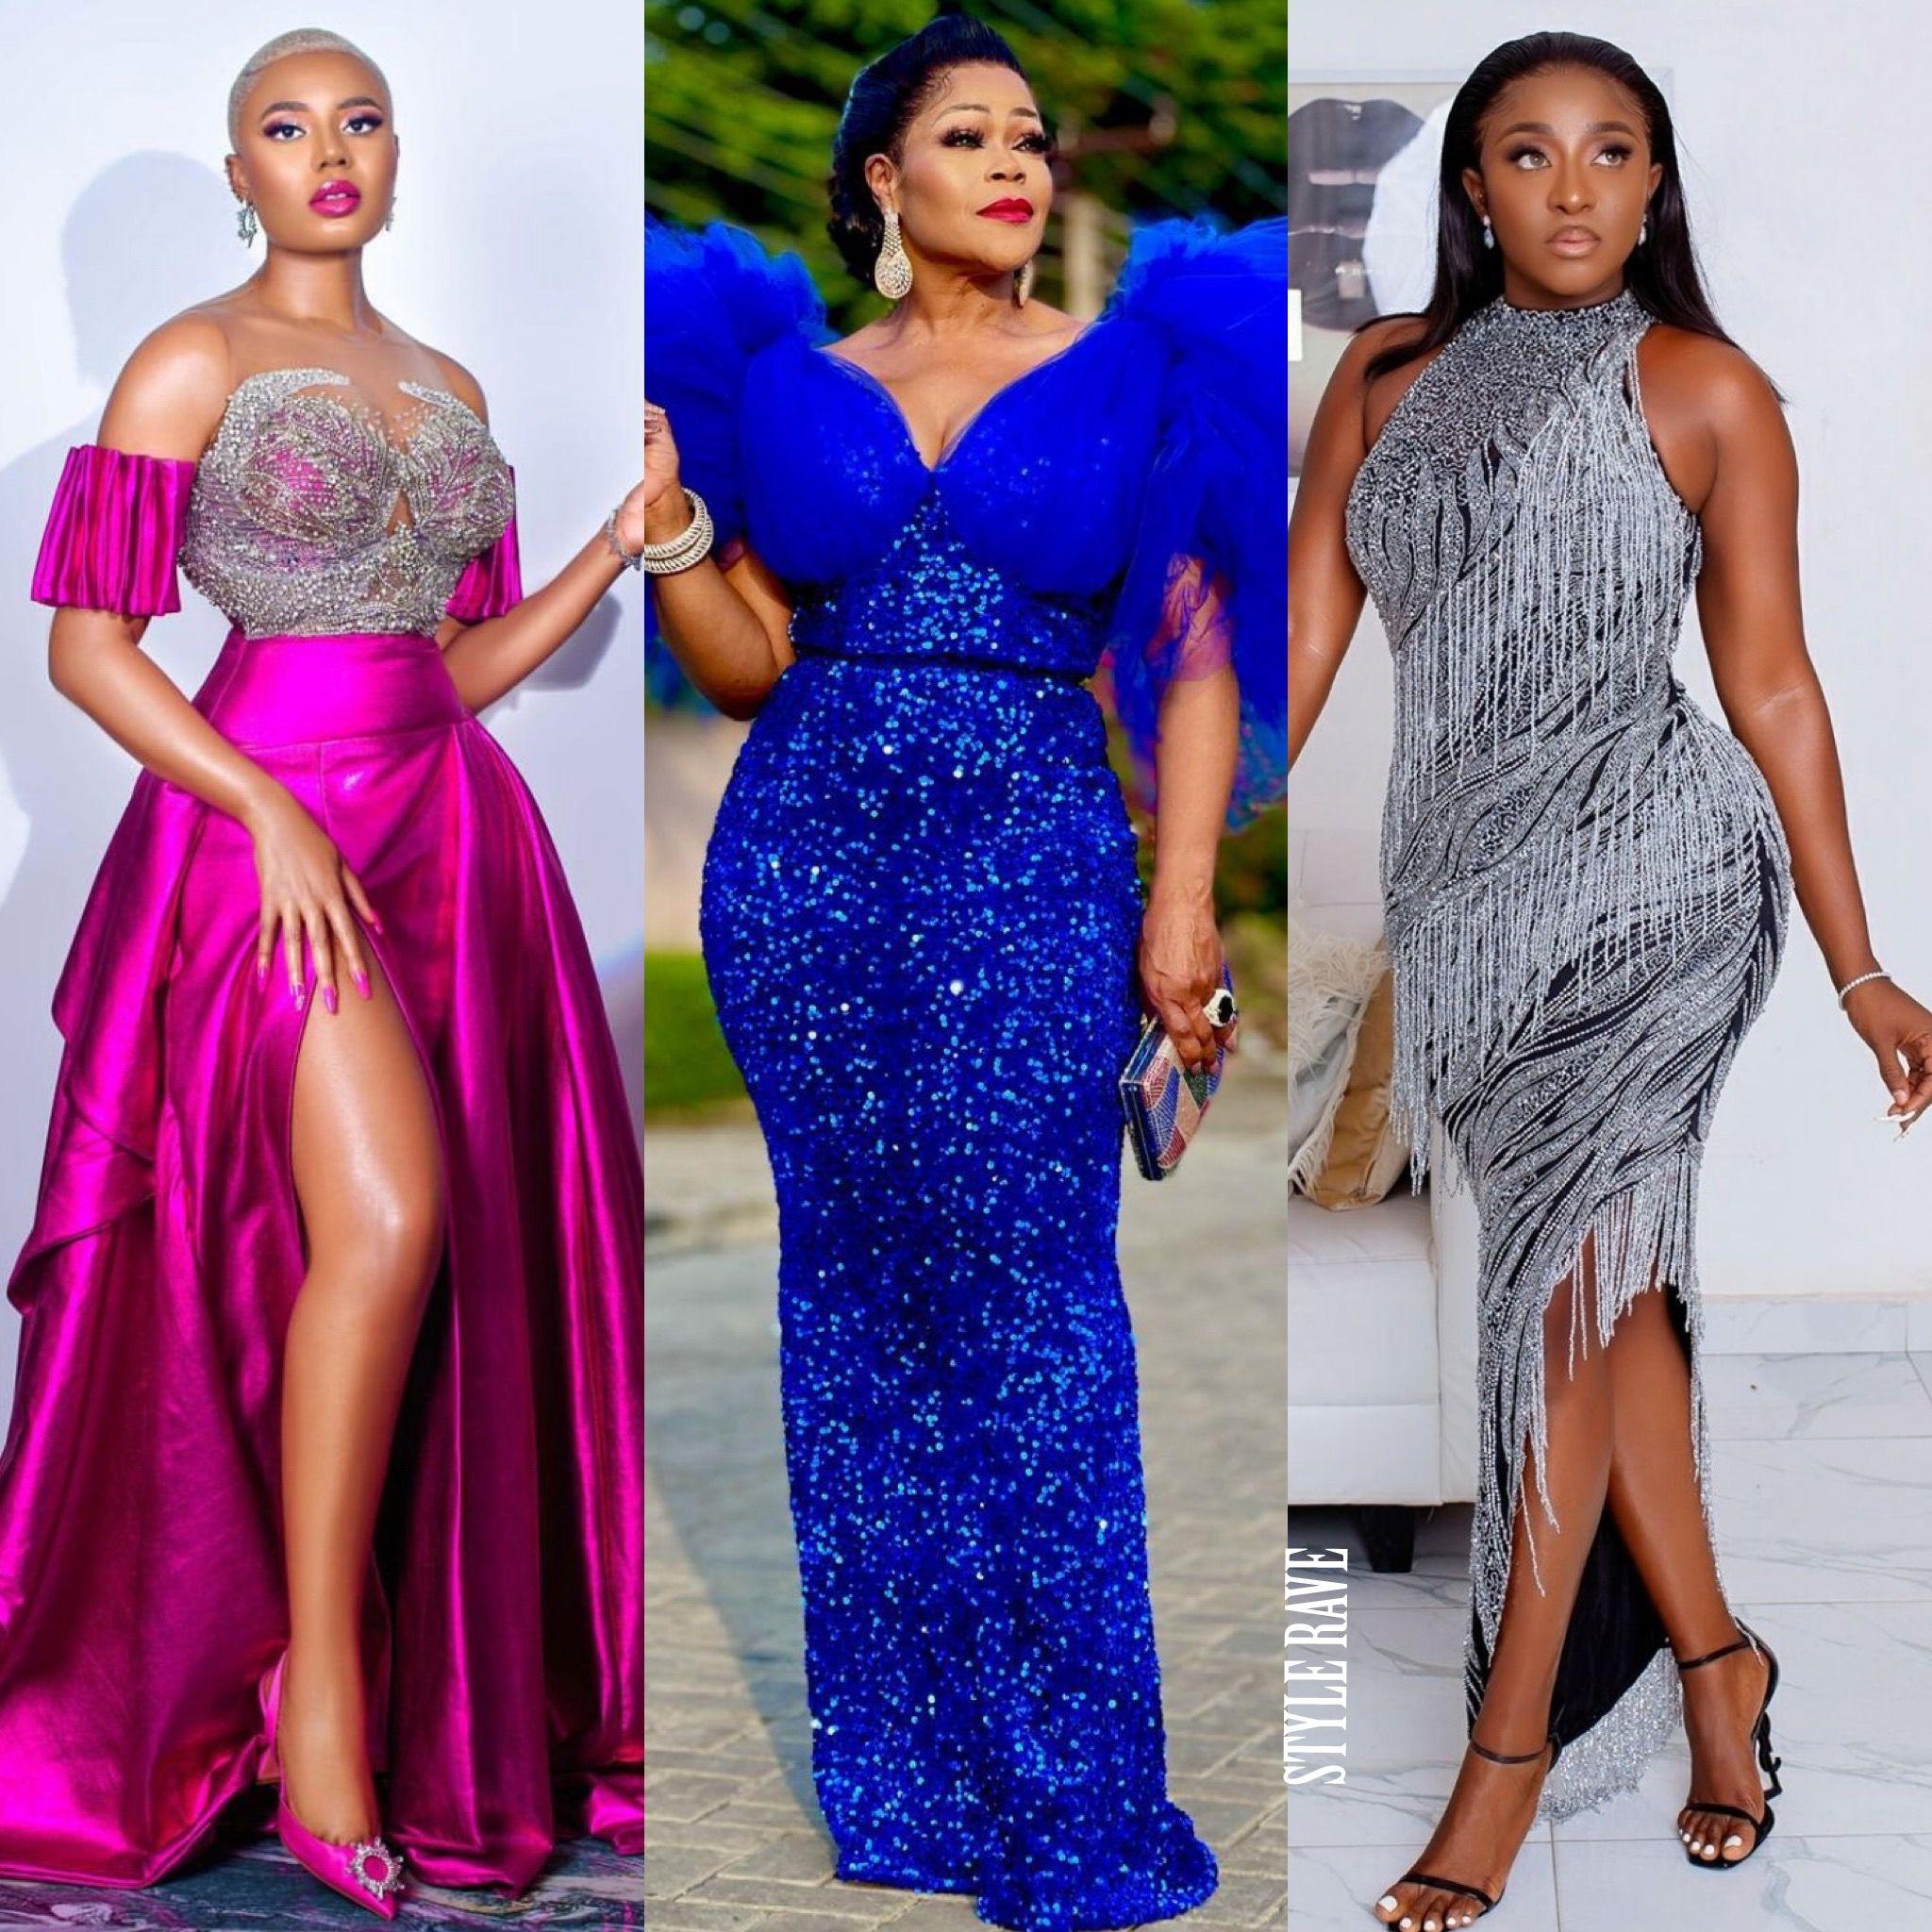 best-dressed-beautiful-african-ladies-stars-bet-on-la-chaude-fashion